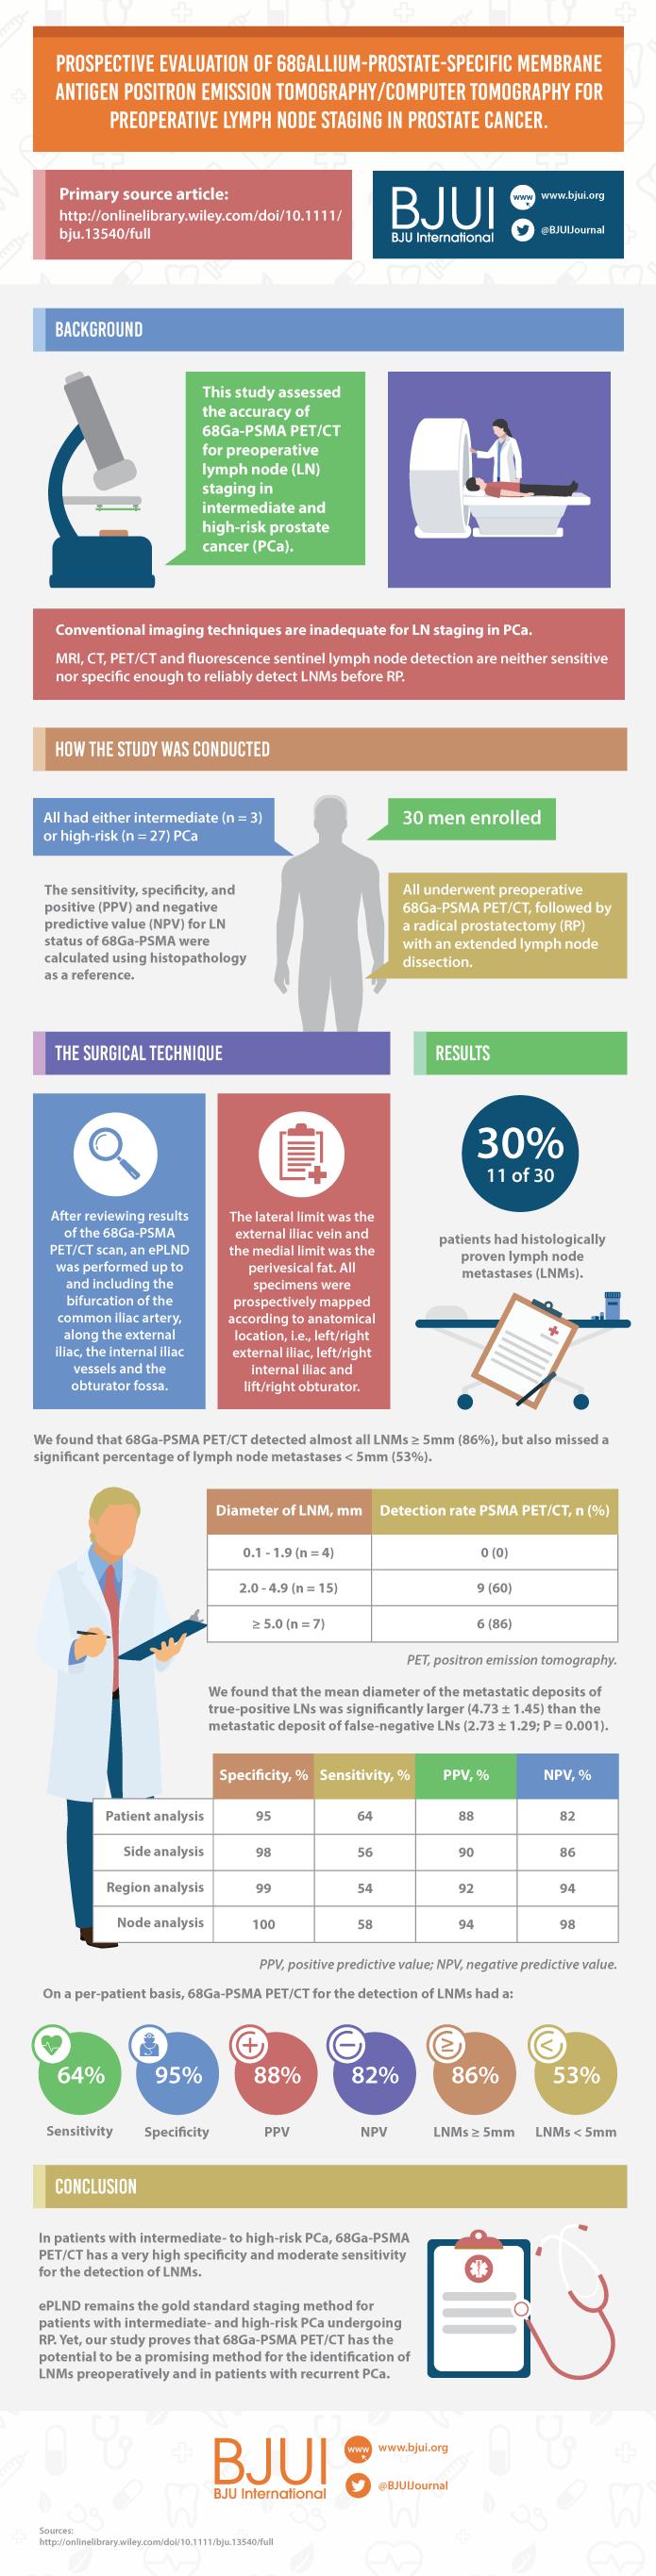 68ga-psma-pet-ct-infographic